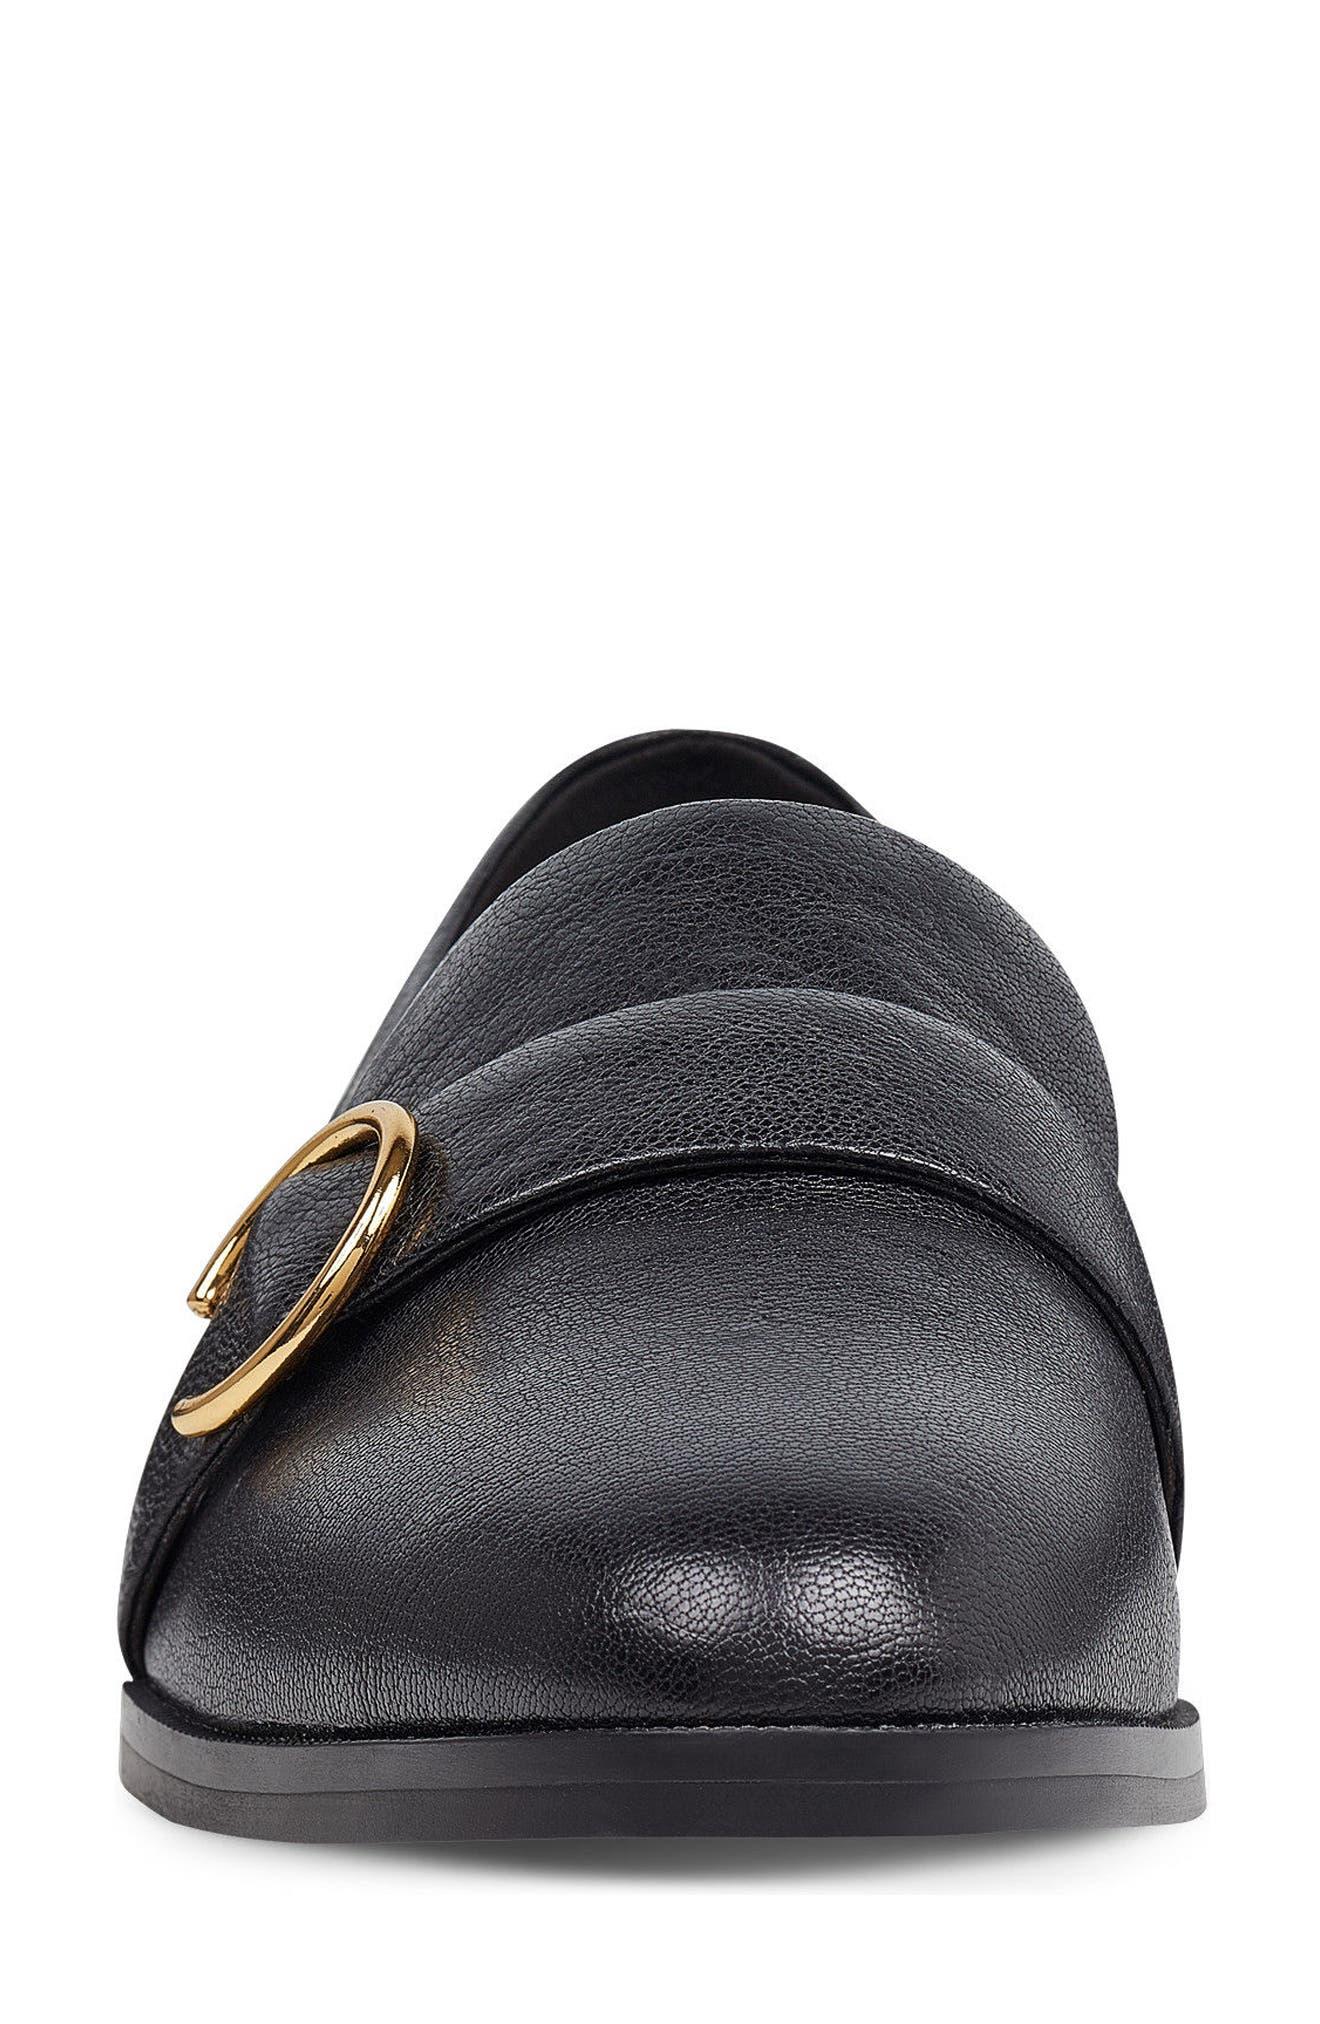 Huff Loafer Flat,                             Alternate thumbnail 4, color,                             Black Leather